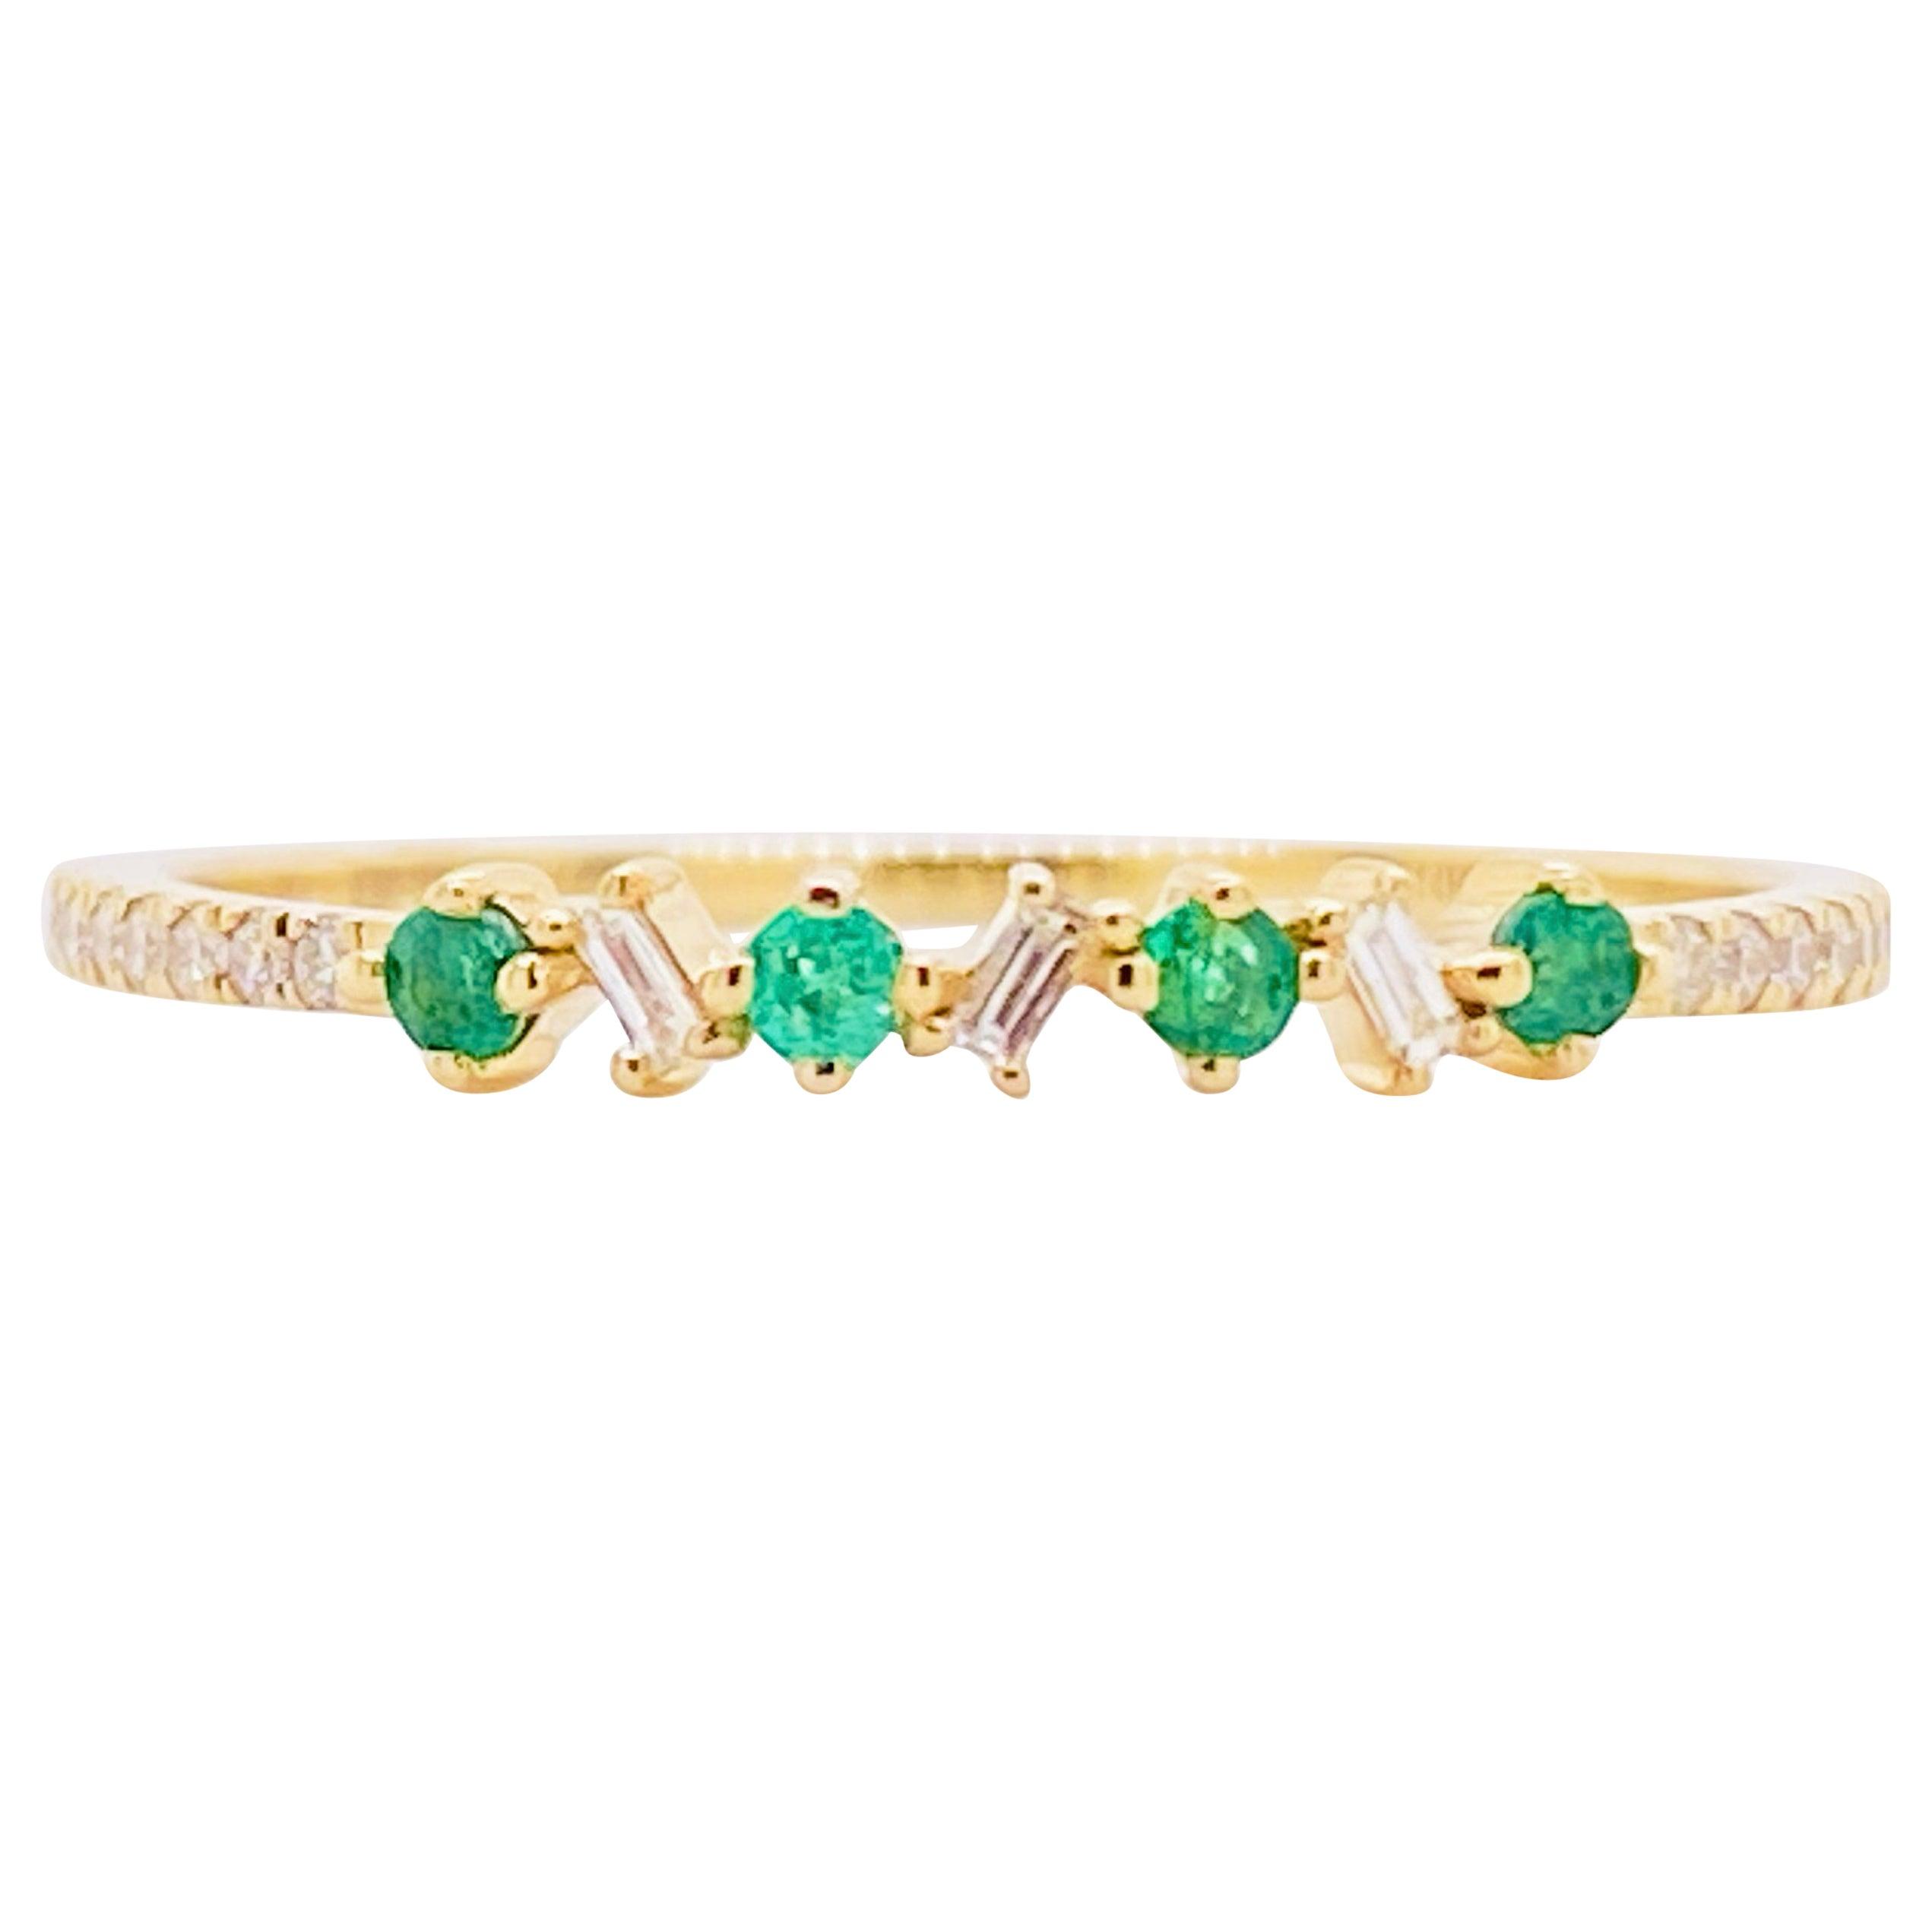 Emerald Diamond Ring, 14 Karat Gold, Round Emerald Baguette Diamond Band Stack